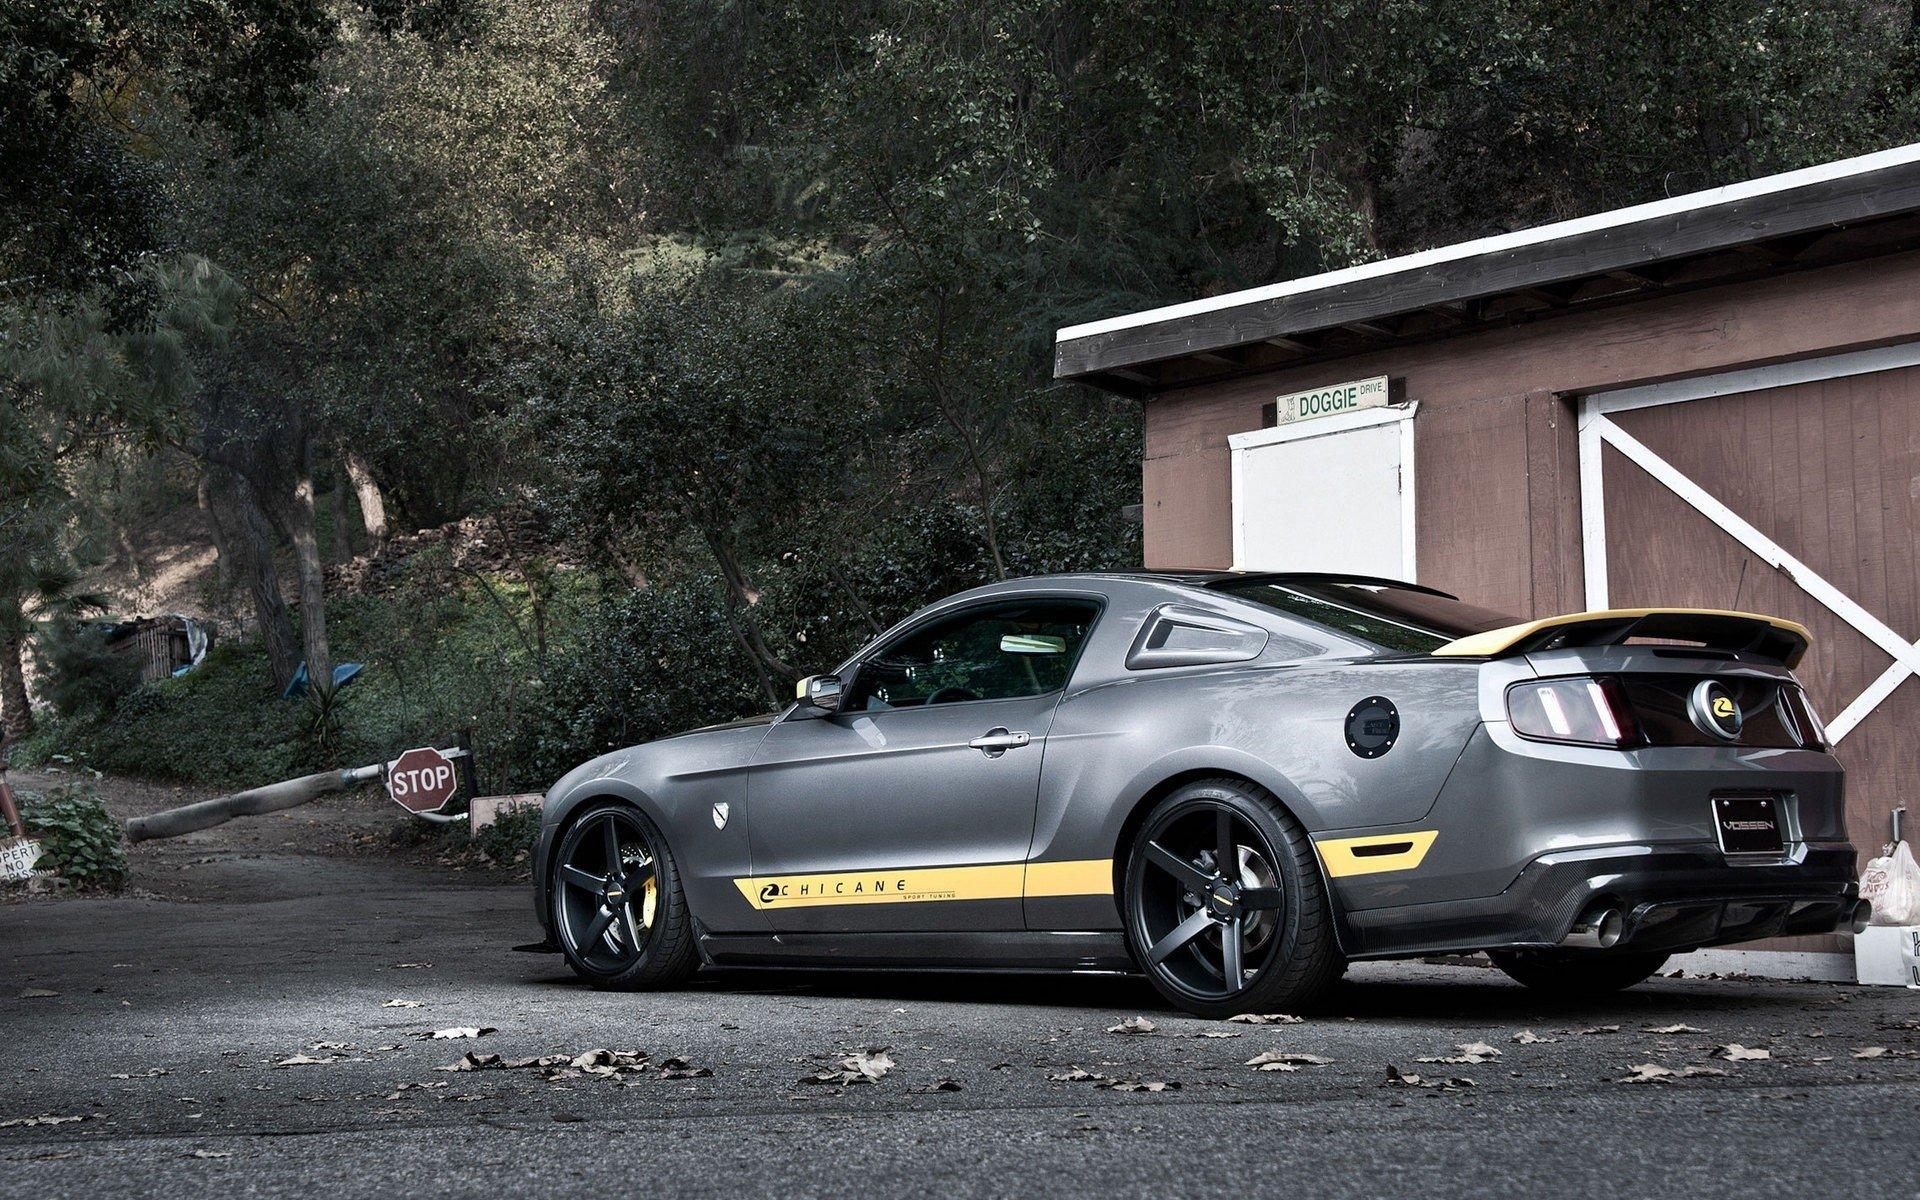 Ford mustang gt full hd fondo de pantalla and fondo de - Muscle cars wallpaper hd pack ...